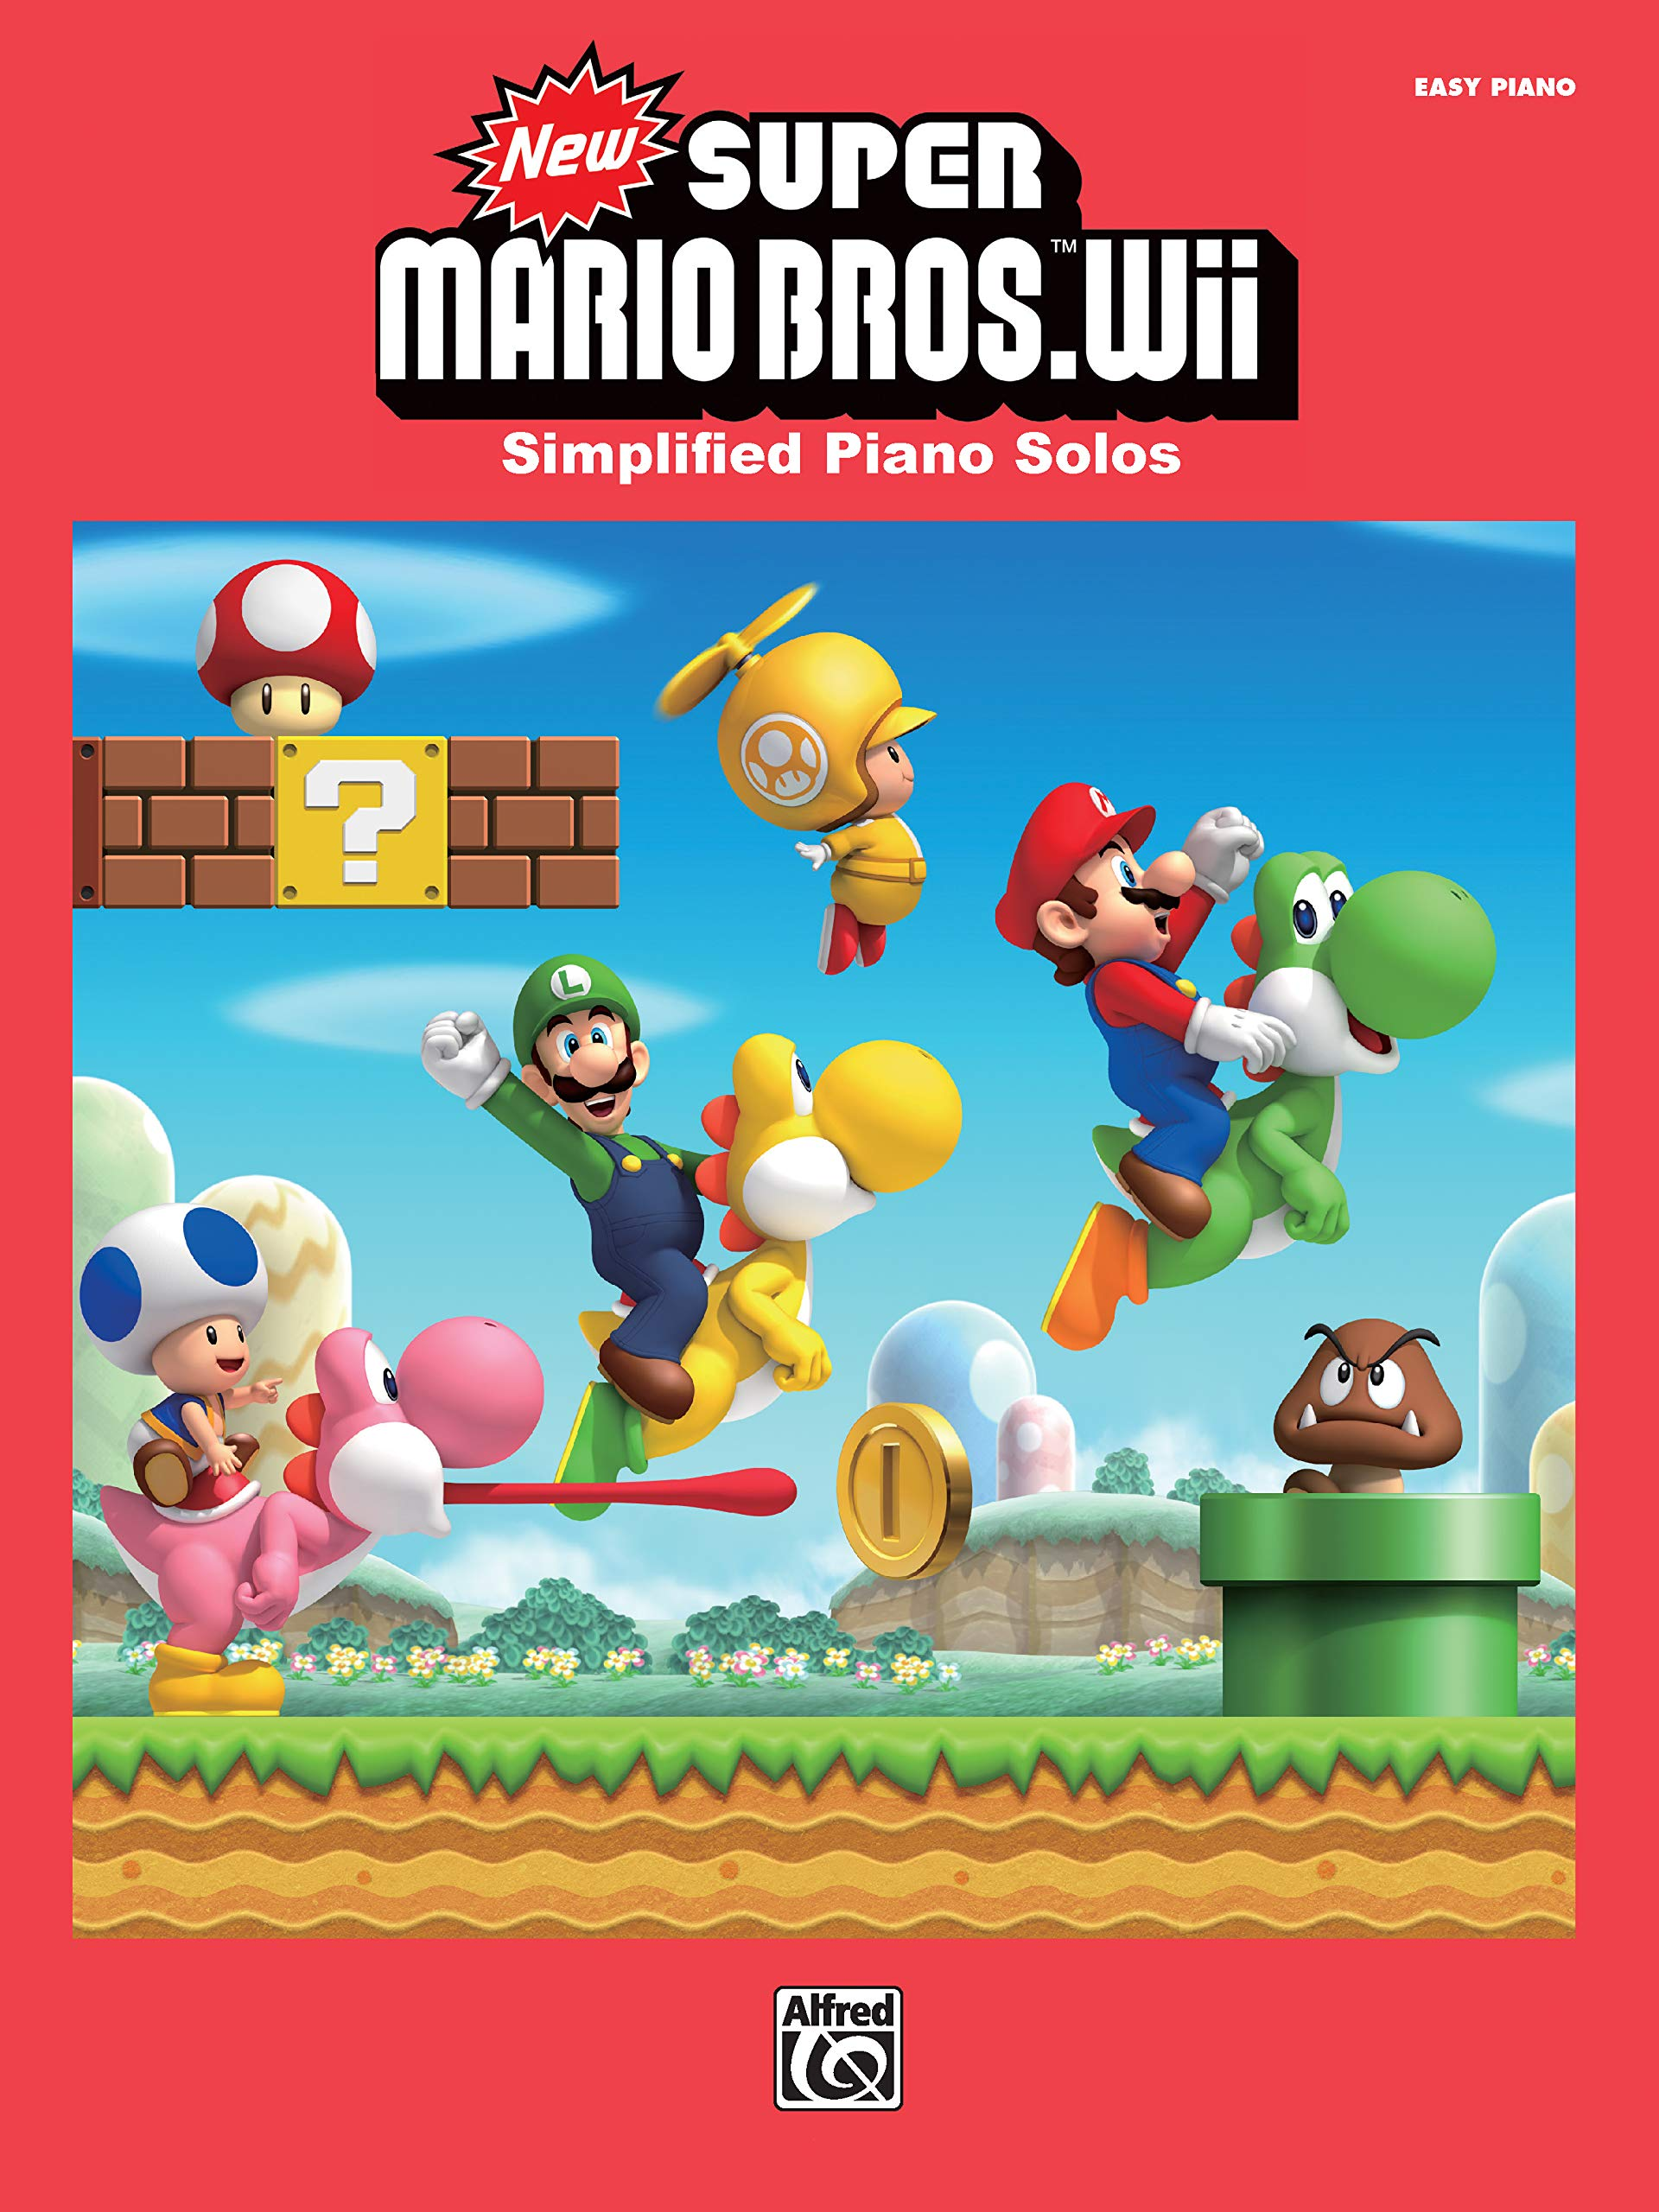 New Super Mario Bros.(TM) Wii: Simplified Piano Solos: Amazon.es: Kondo, Koji, Nagata, Kenta, Fujii, Shiho, Nagamatsu, Ryu: Libros en idiomas extranjeros